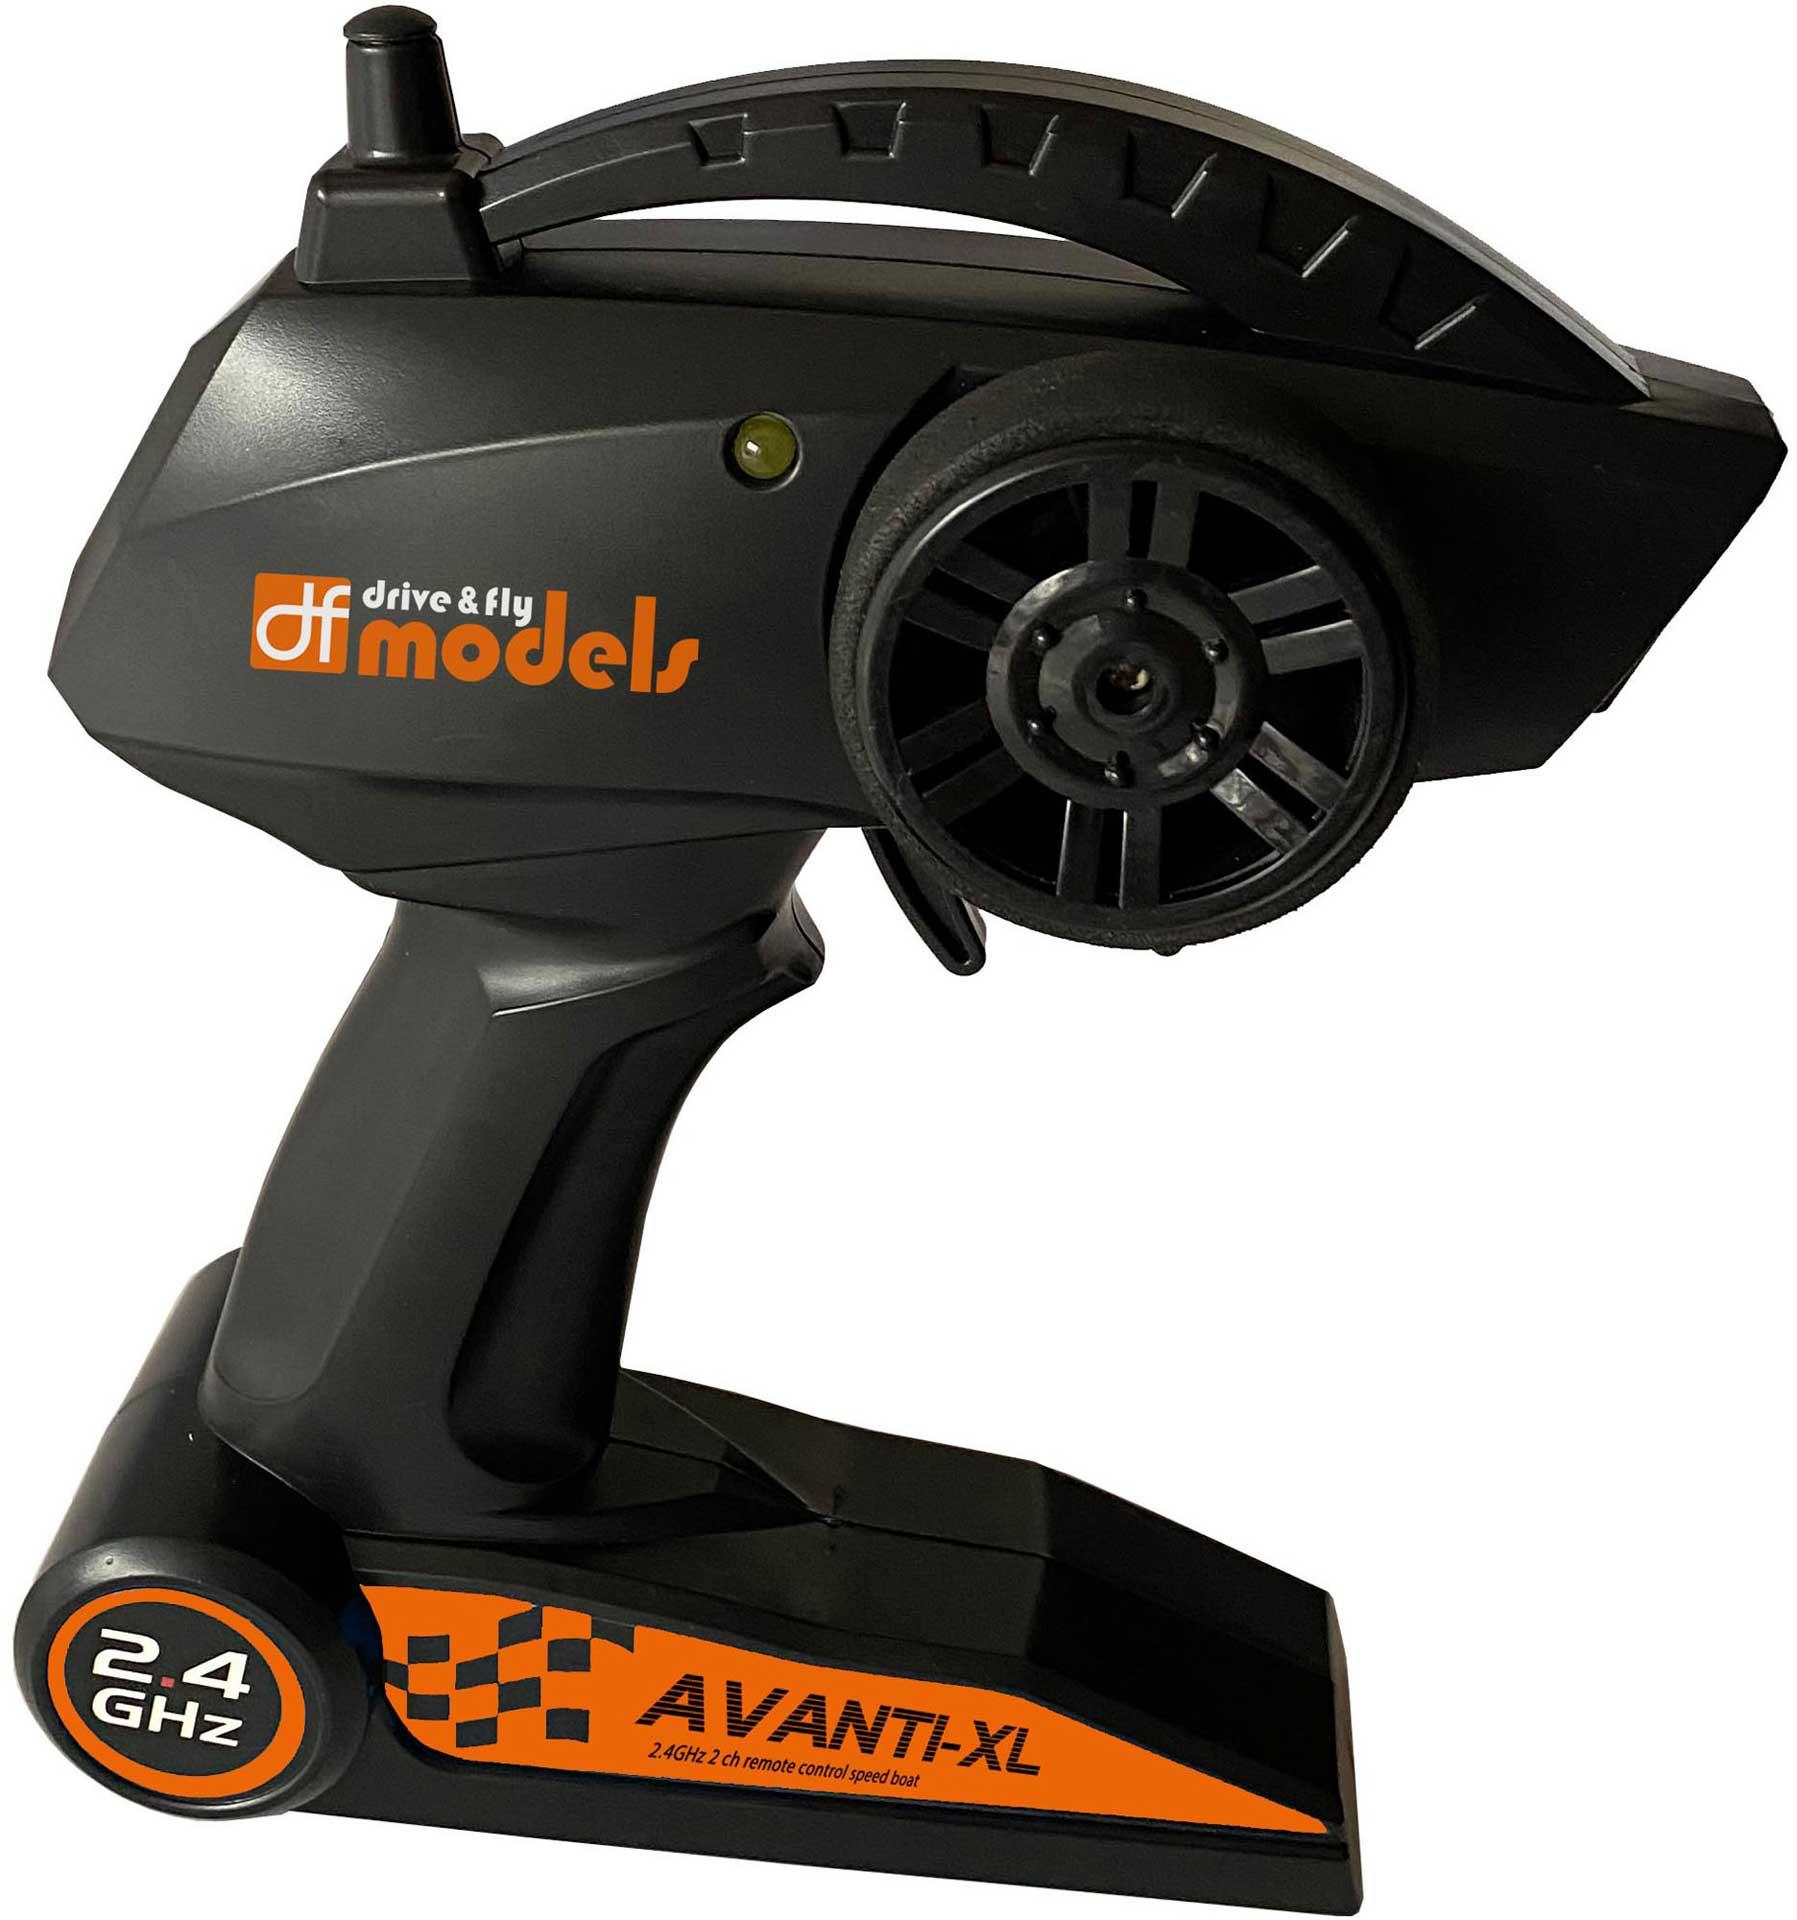 DRIVE & FLY MODELS Sender zu 3670 AVANTI-XL Boot RTR